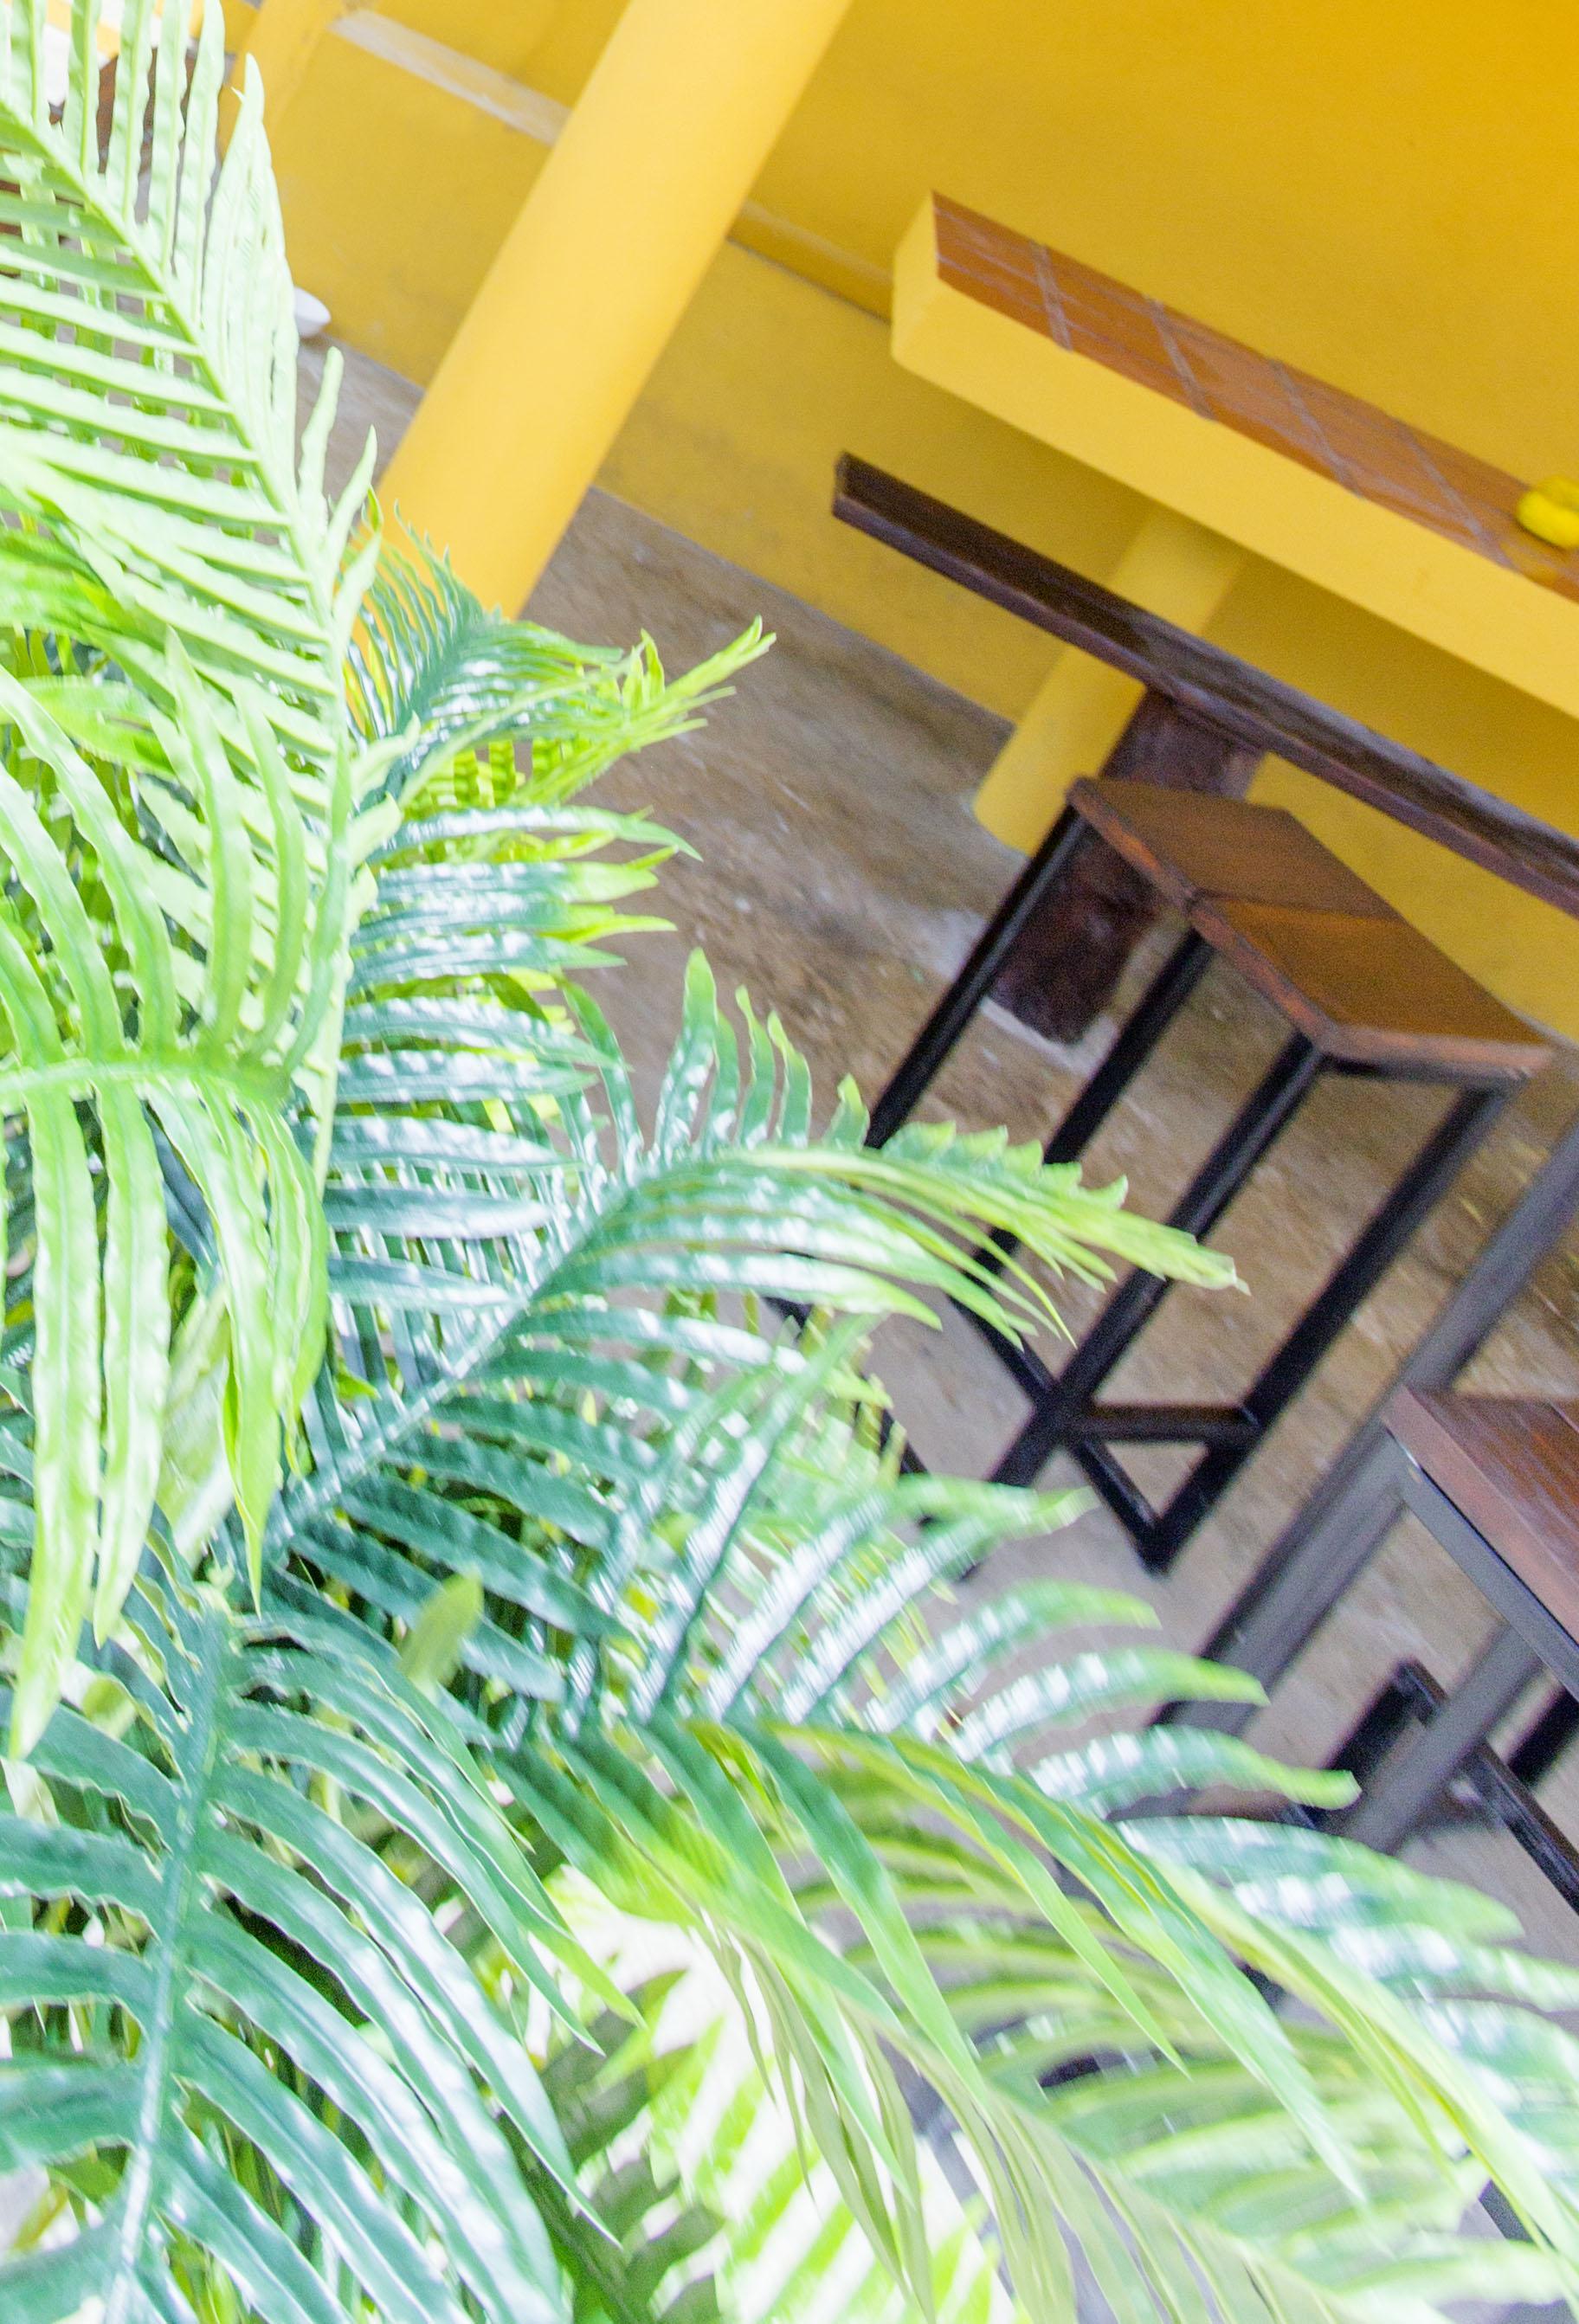 StageDesk-Curaçao-Stagehuis-BergAltena-Pelikaan-huis14.jpg